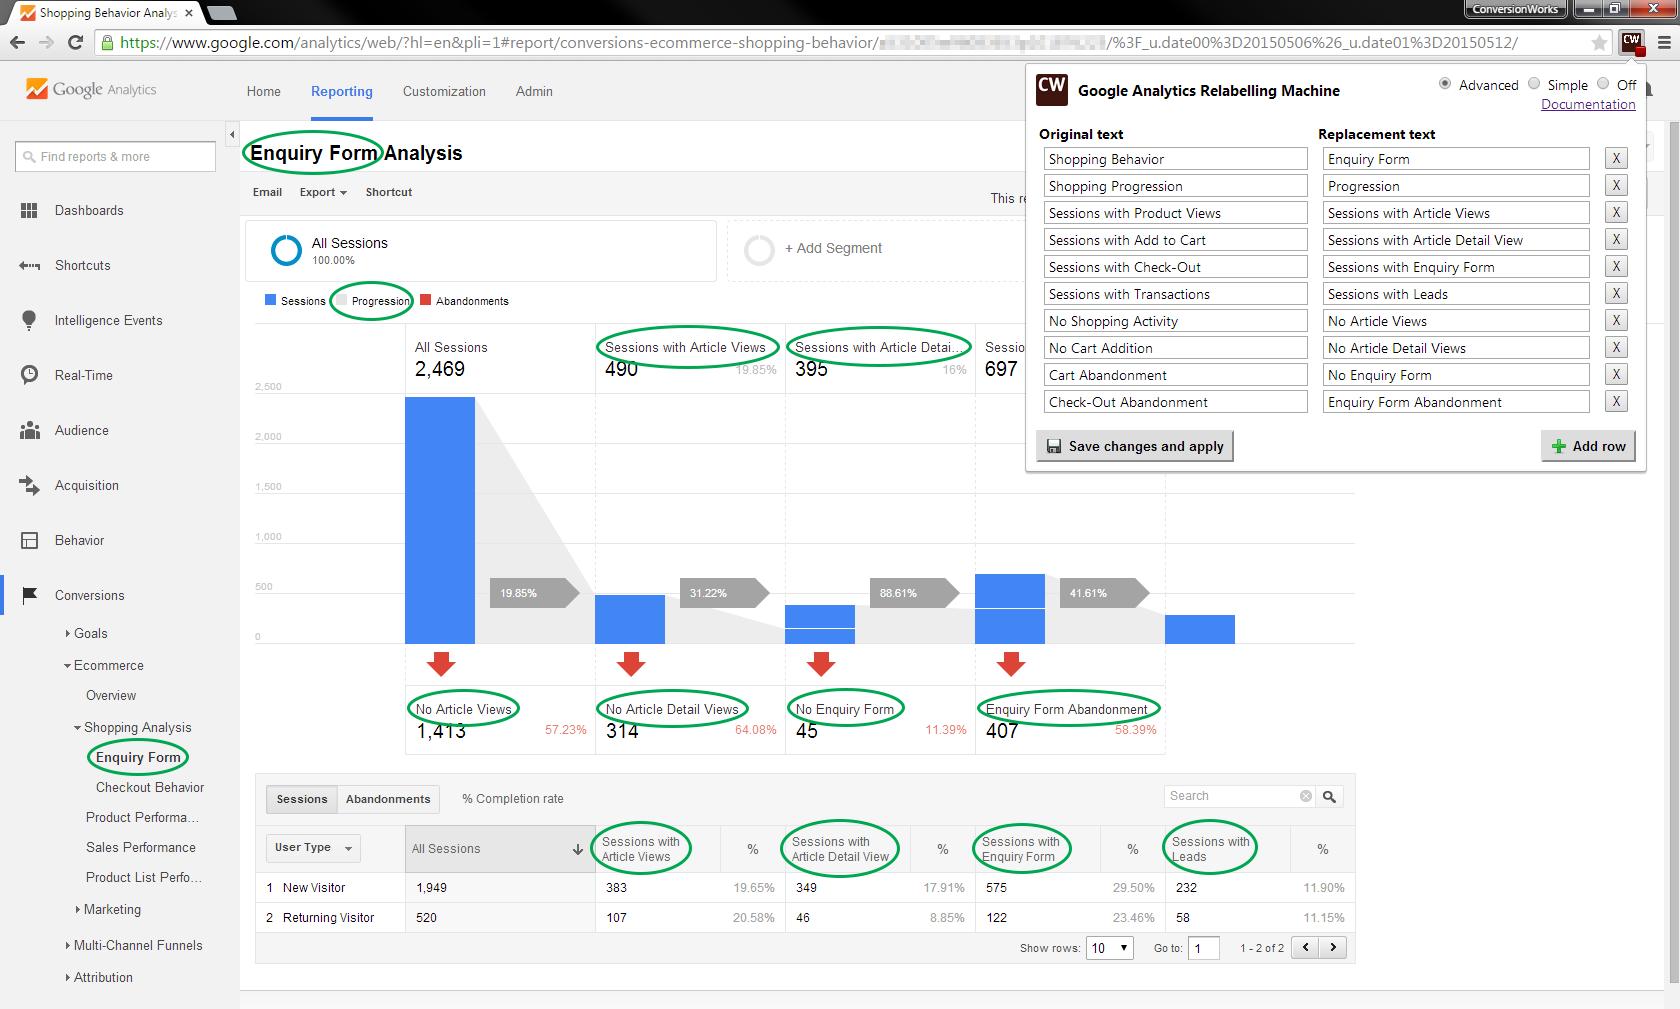 google analytics relabelling-machine